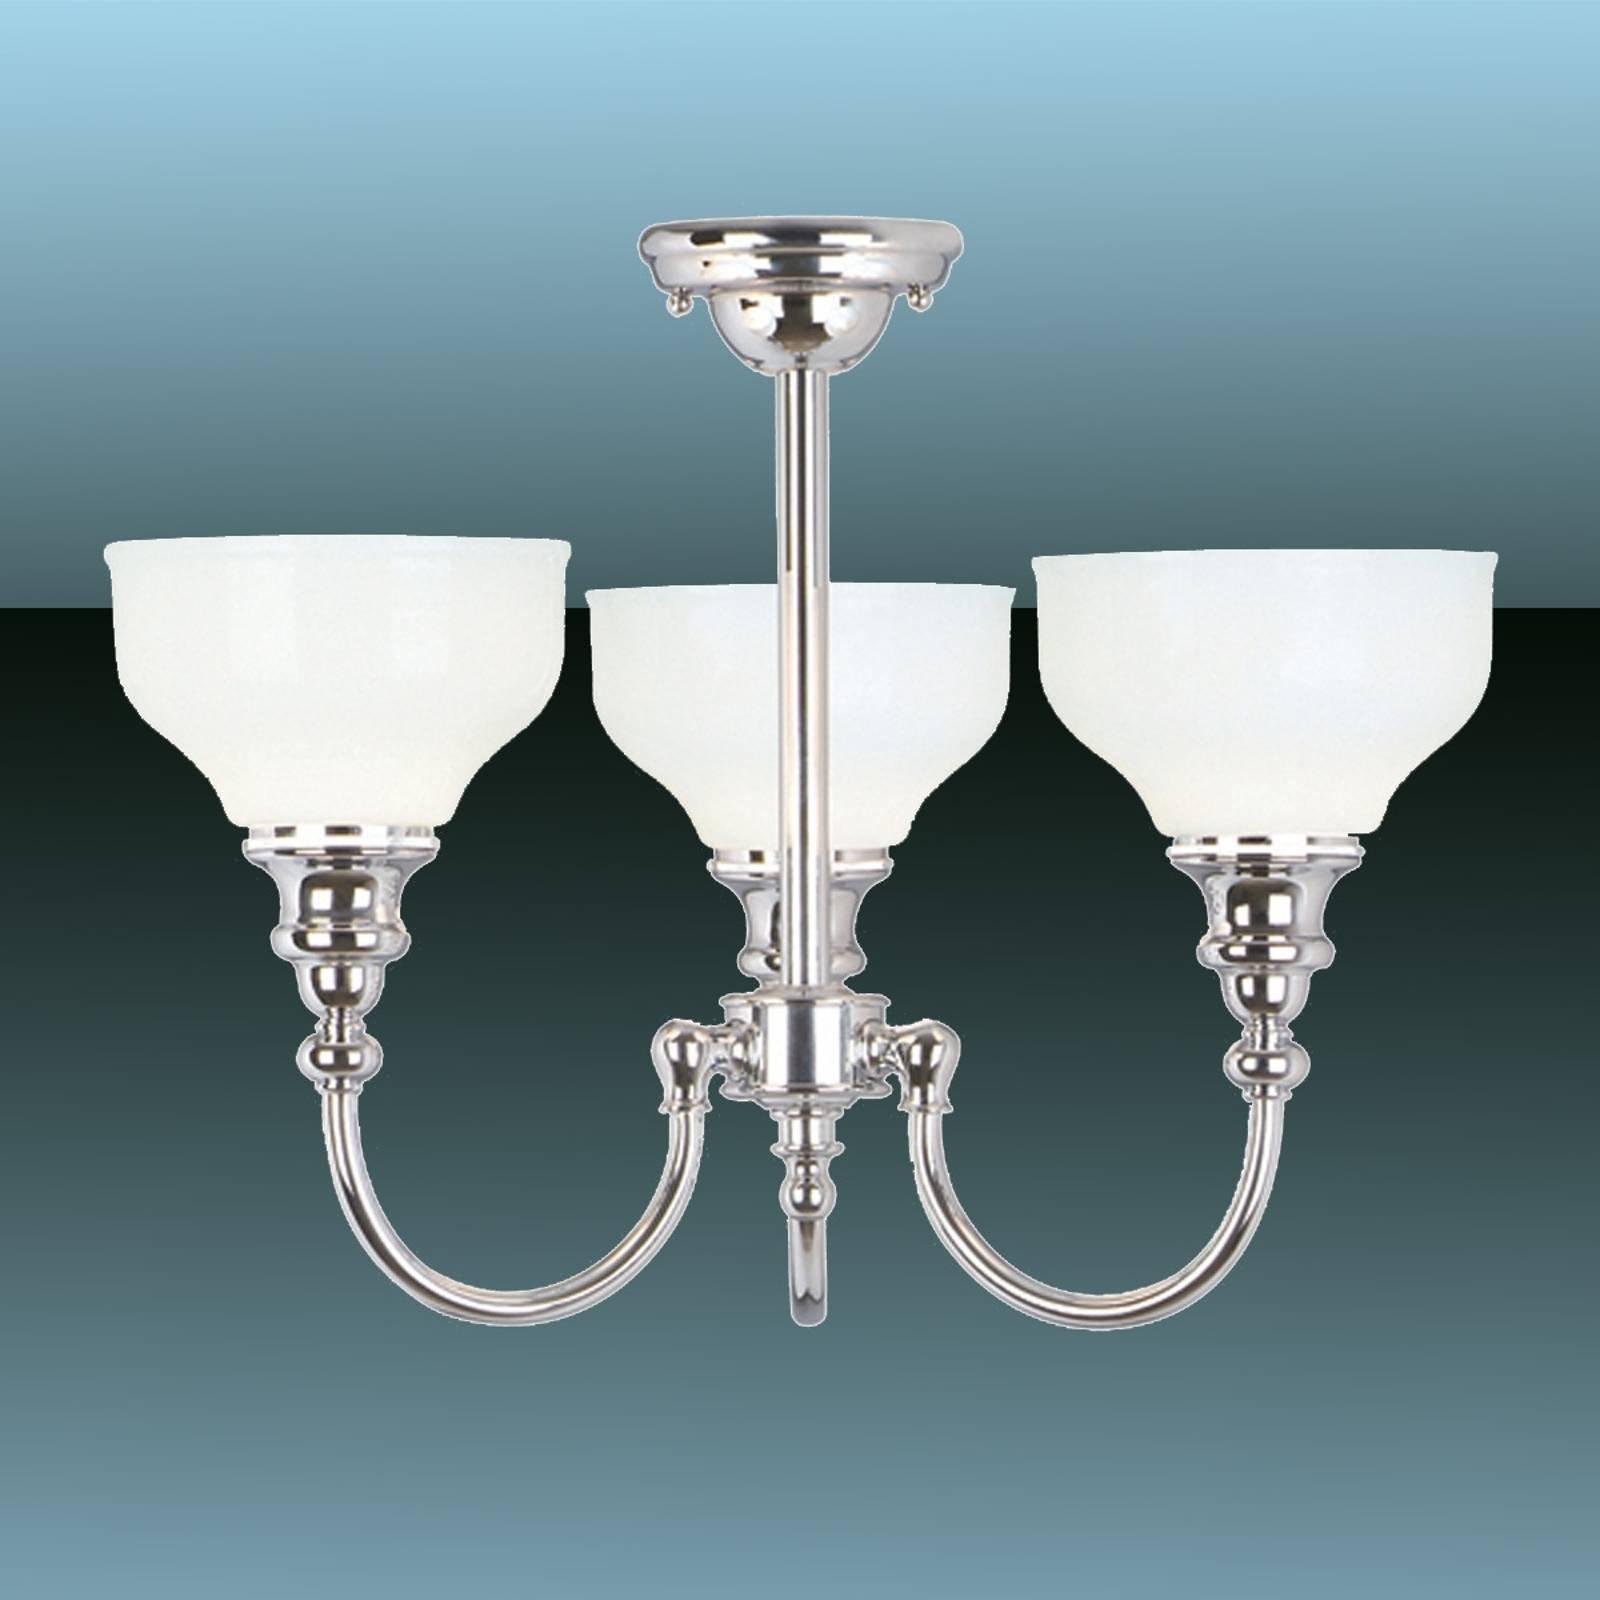 Cheadle taklampe for baderom med tre lys